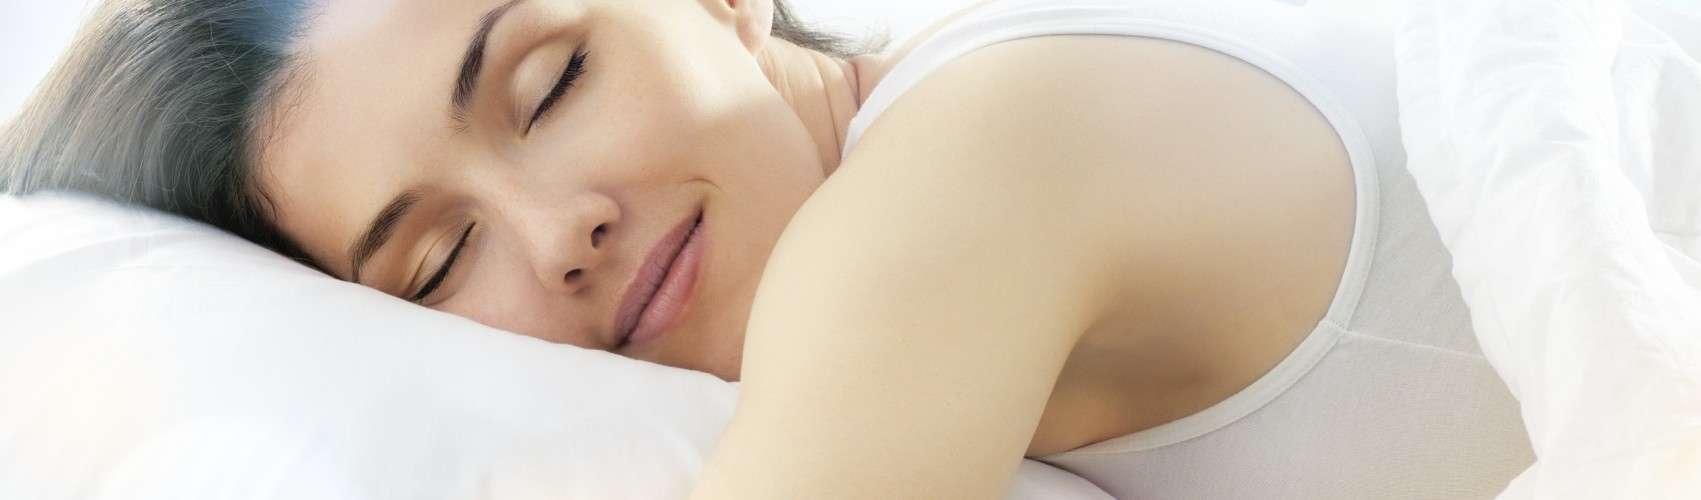 Veselīgs miegs